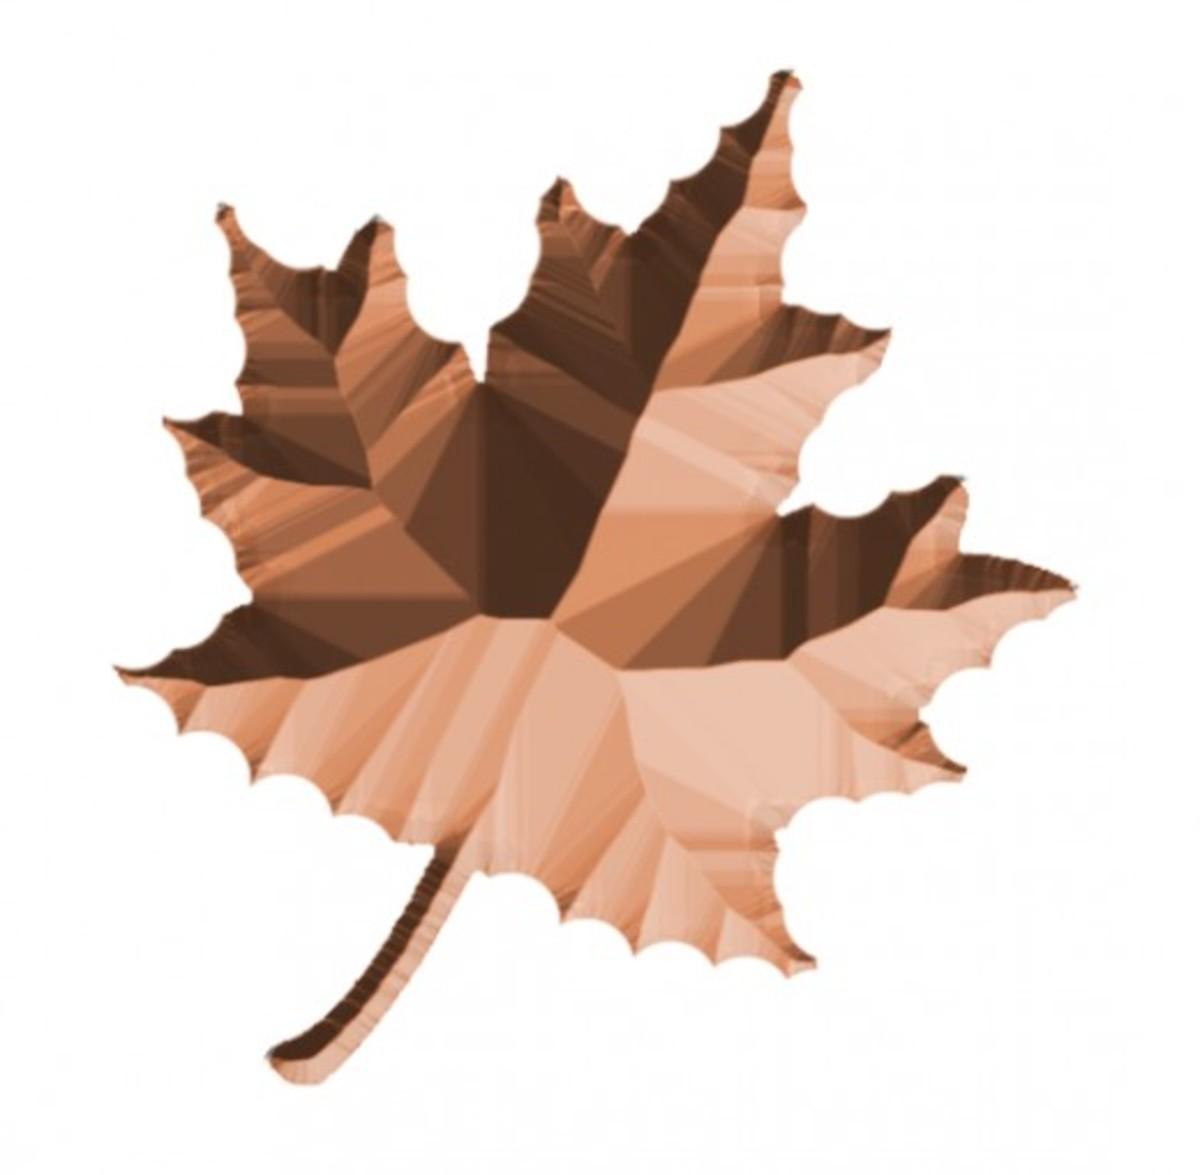 Textured foliage 3.